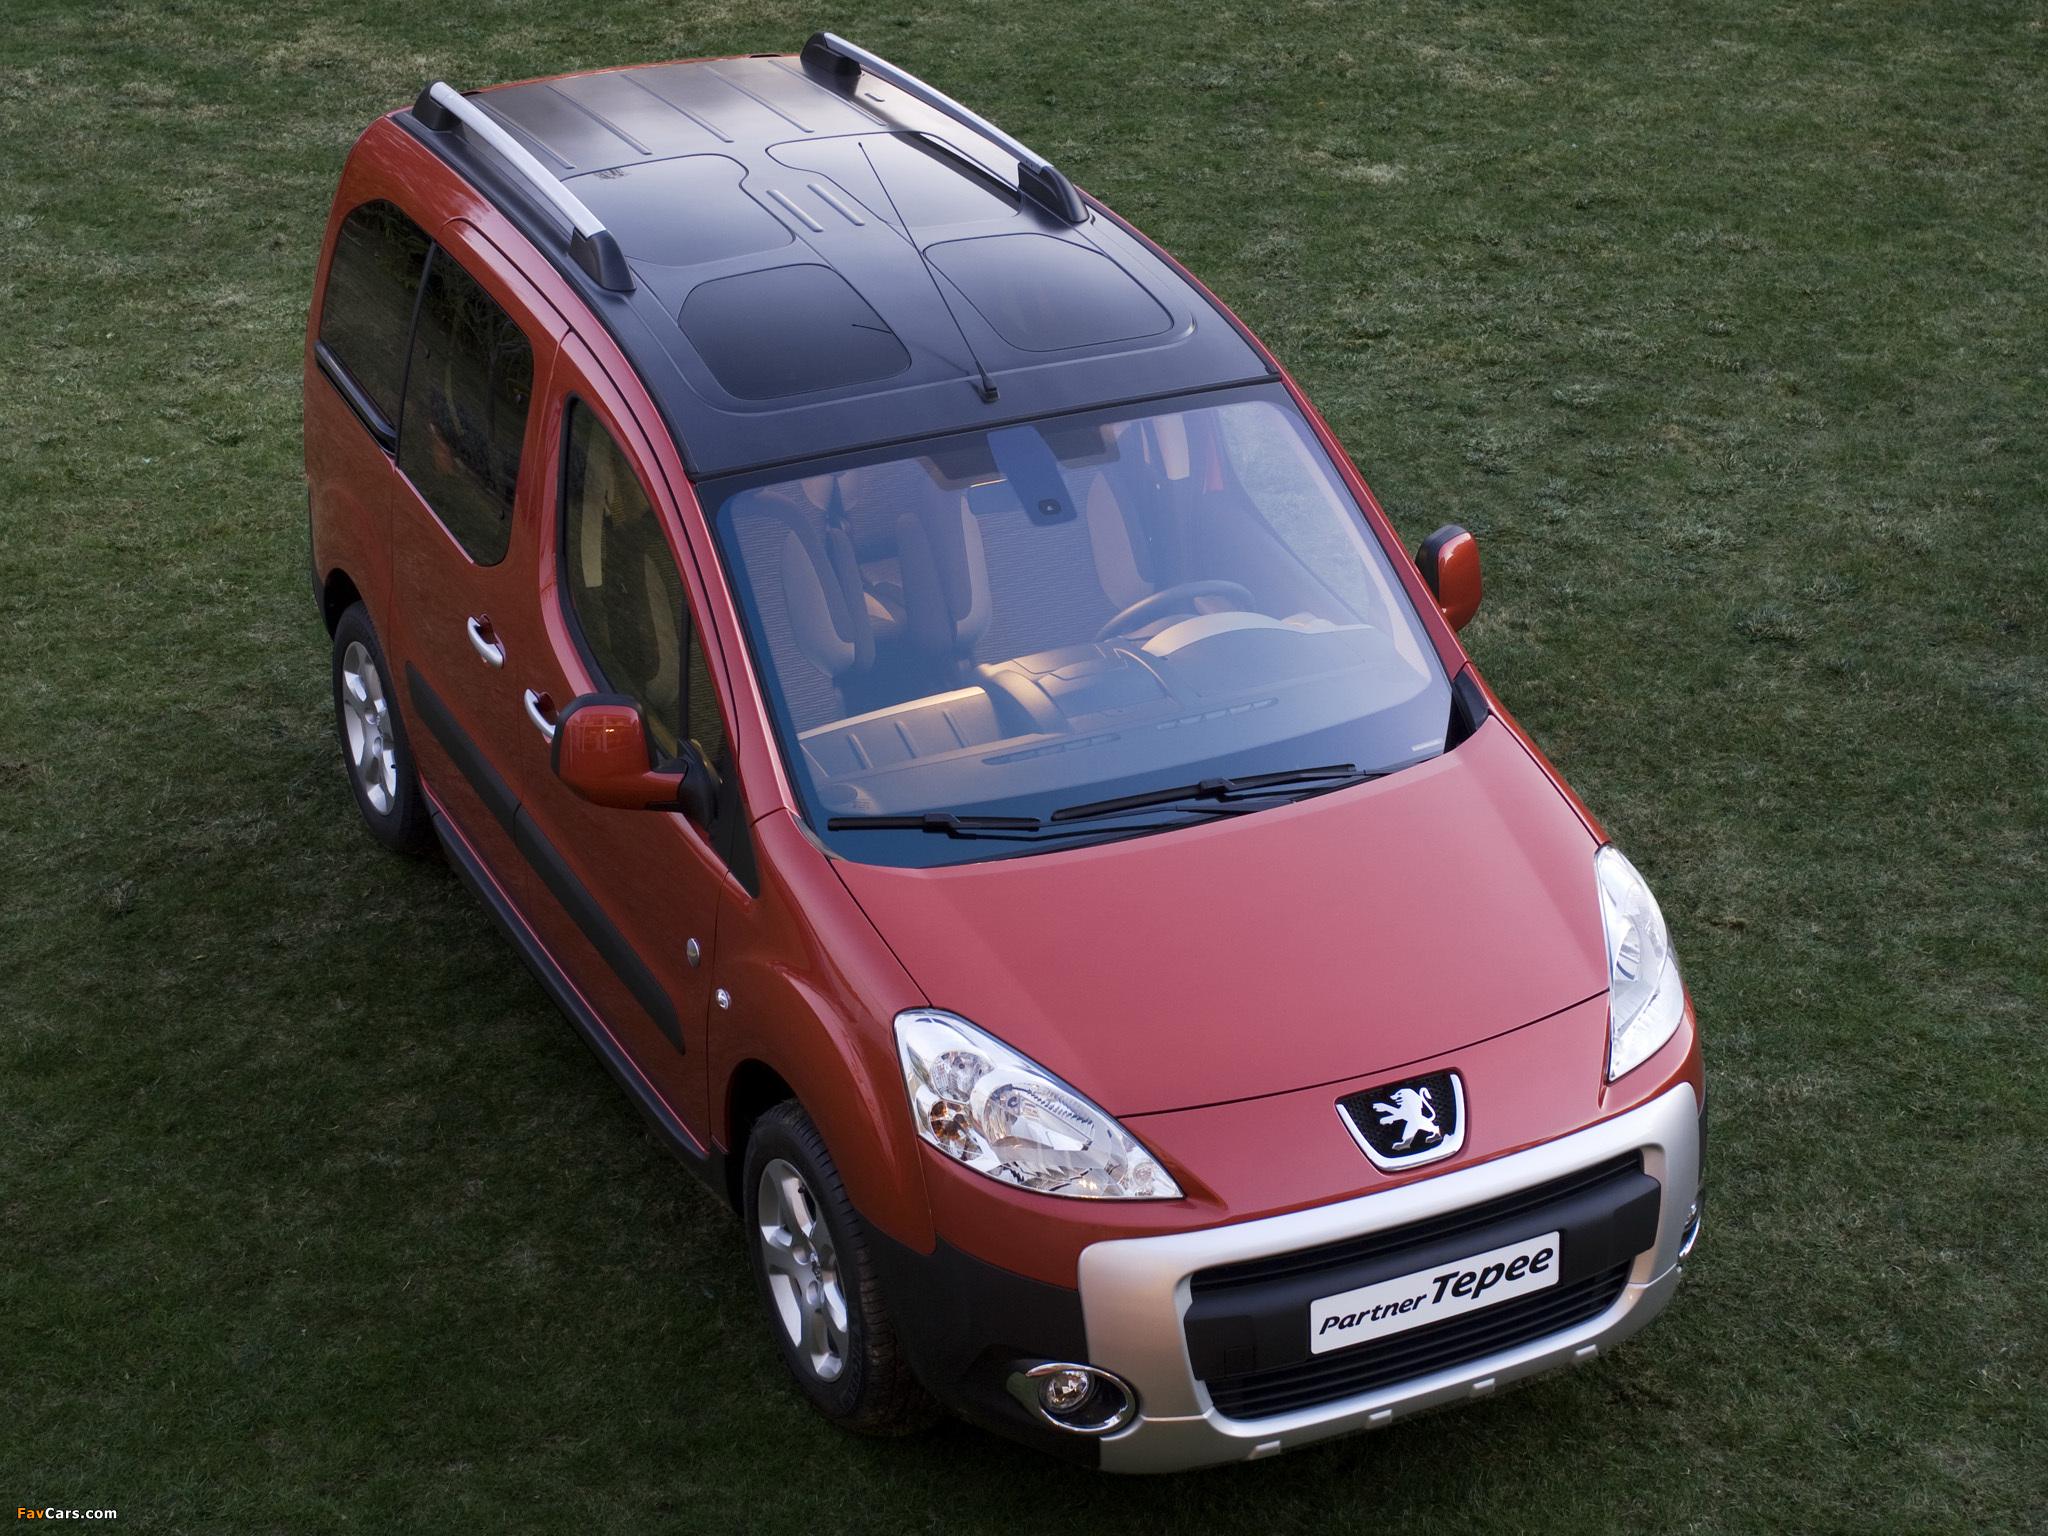 Peugeot Partner Tepee Outdoor Pack 2010 photos (2048 x 1536)